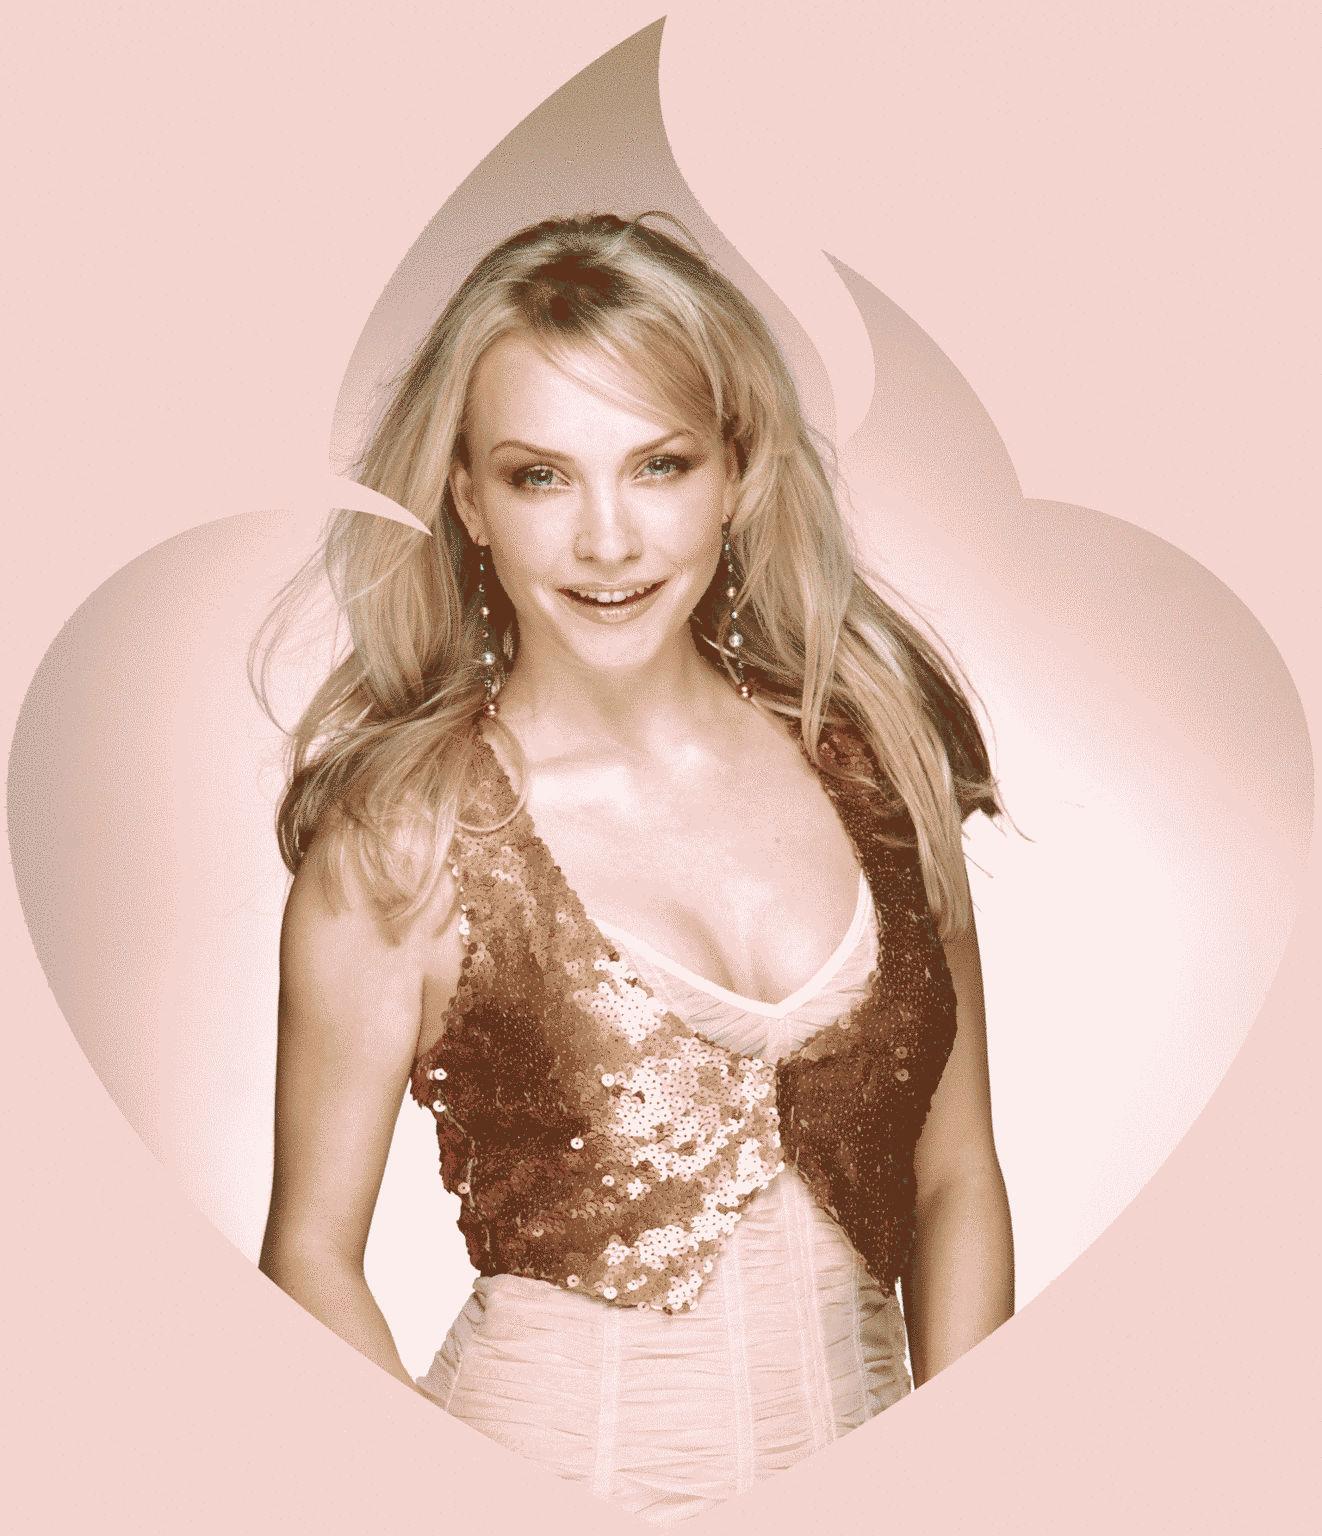 Janin Reinhardt leaked photos (69751). Best celebrity